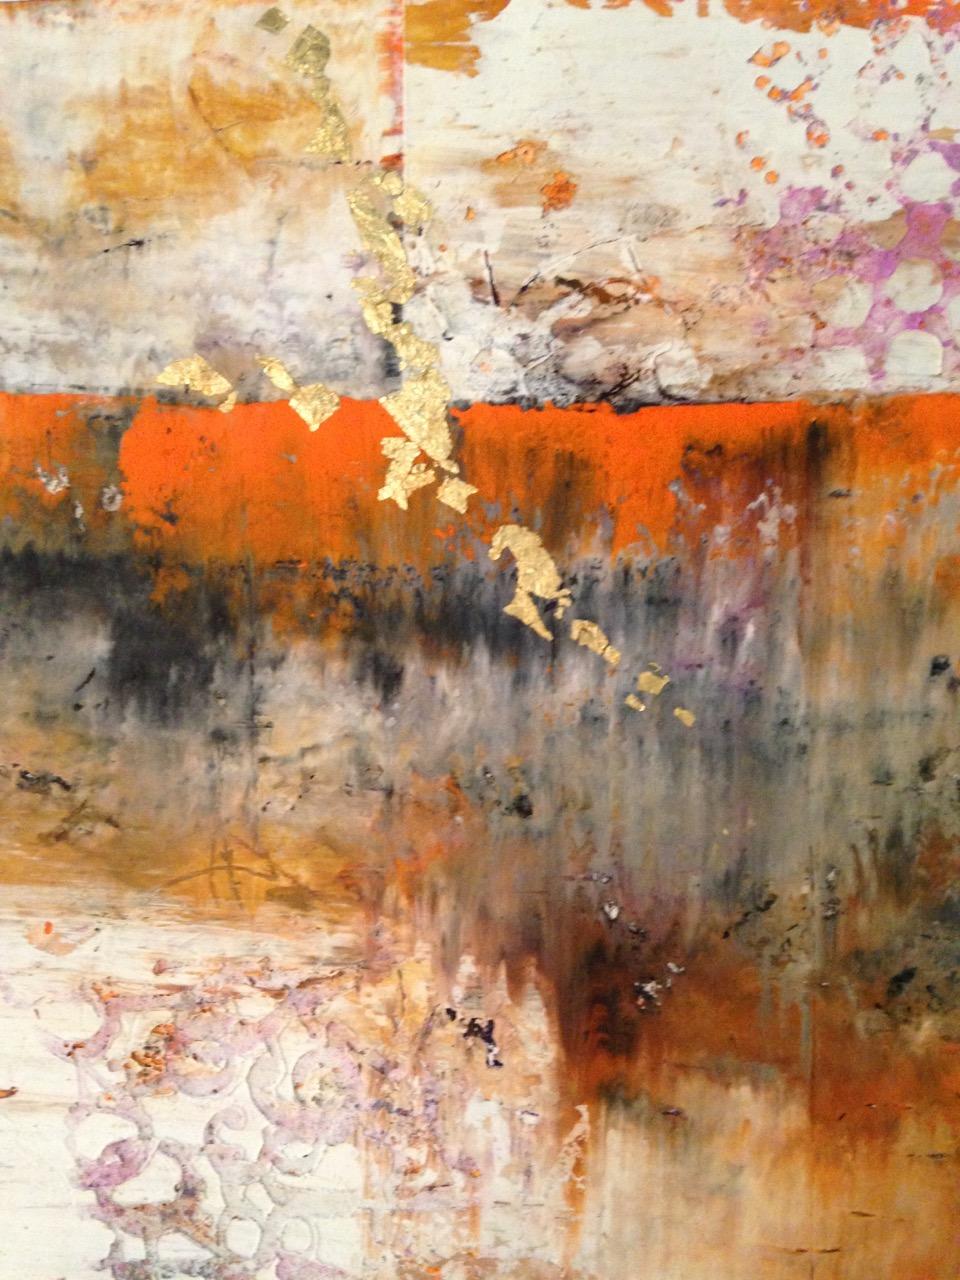 Abstract Orange #1